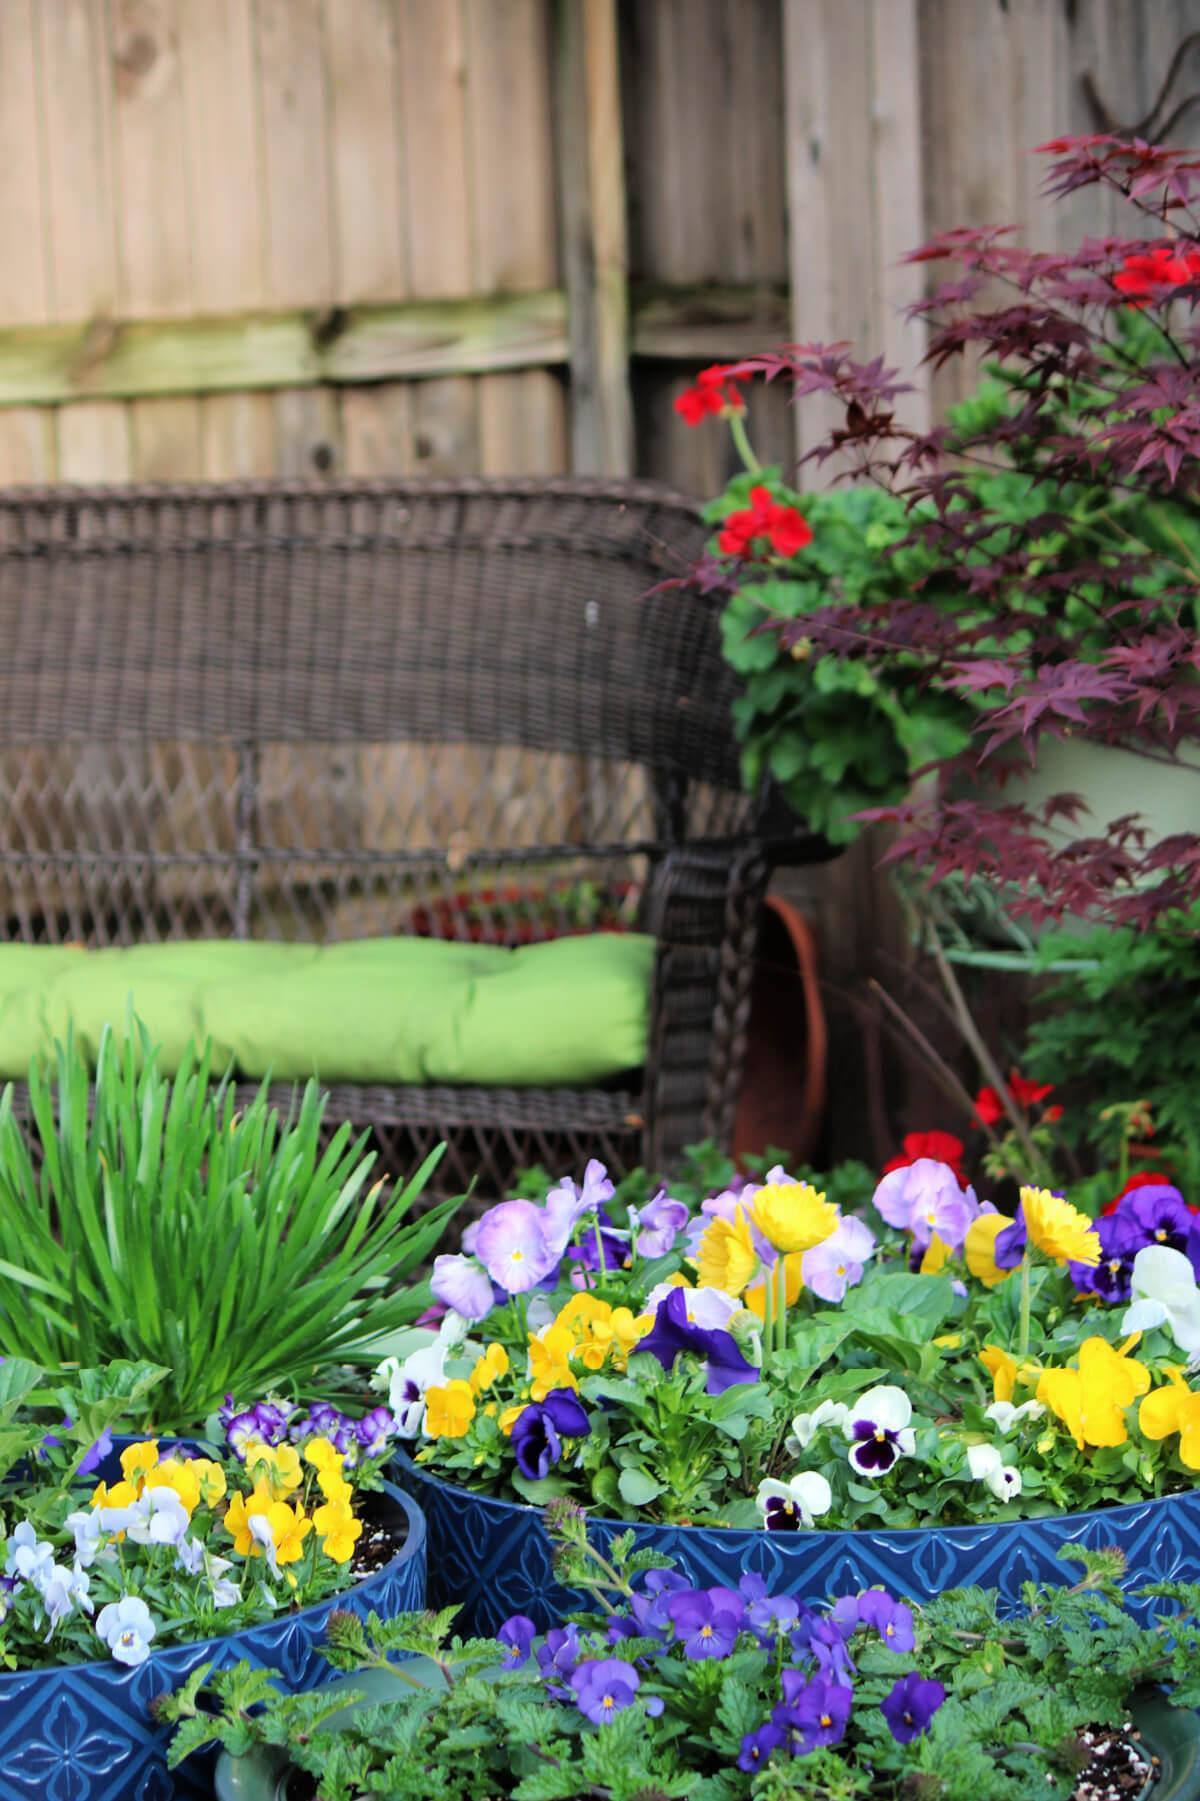 Status Of The Patio Garden: April 26, 2021